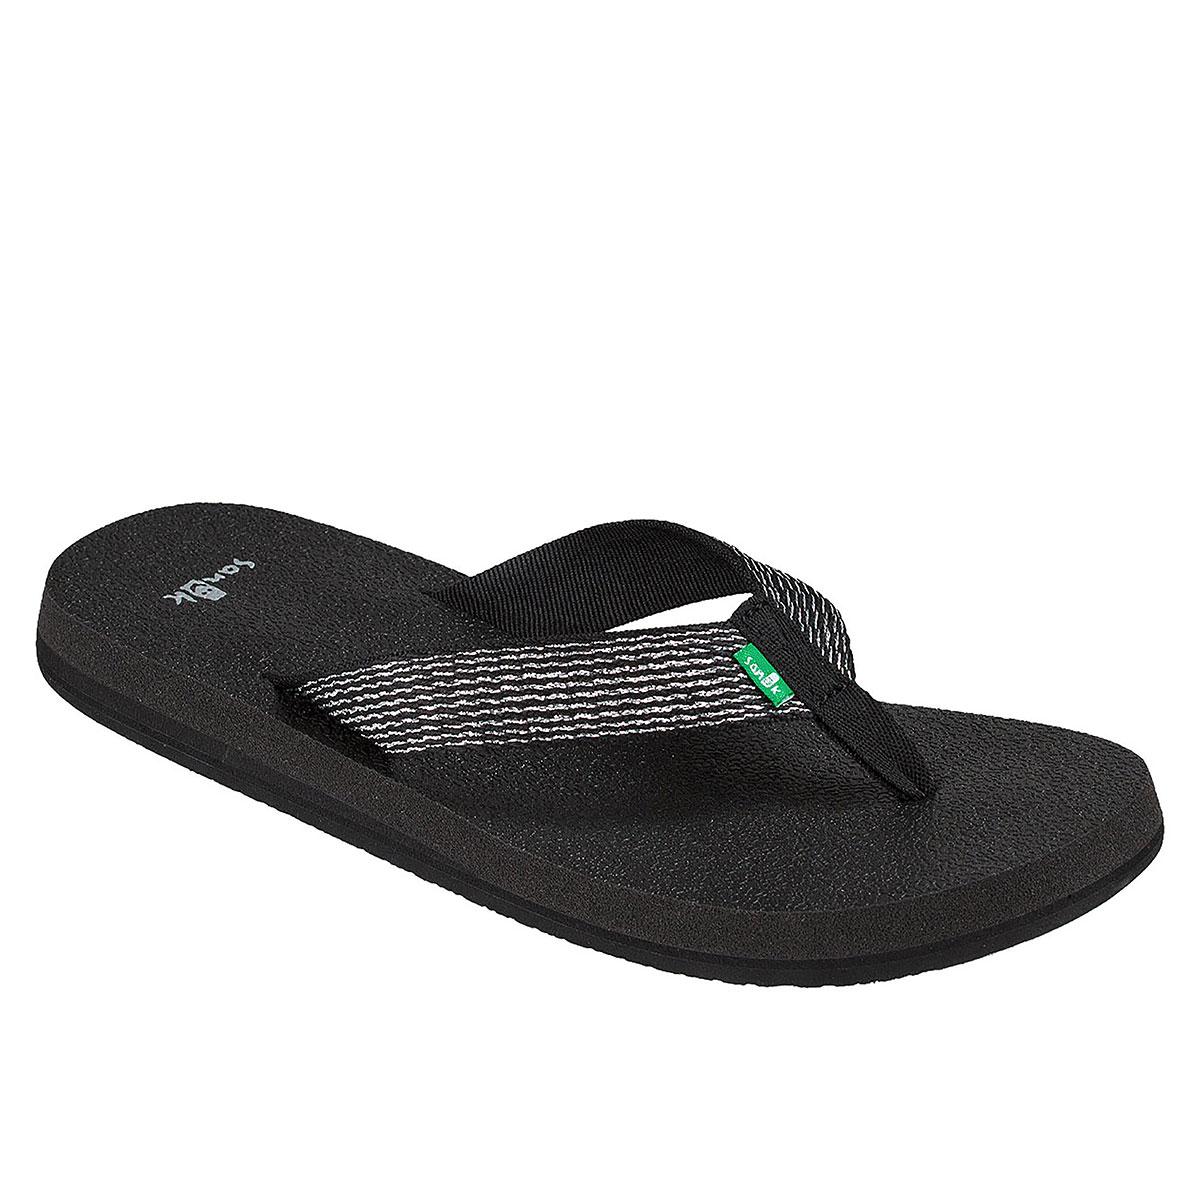 b43c88533e9333 Sanuk Yoga Mat Web-Bling Women s Flip Flops Black   Silver 7